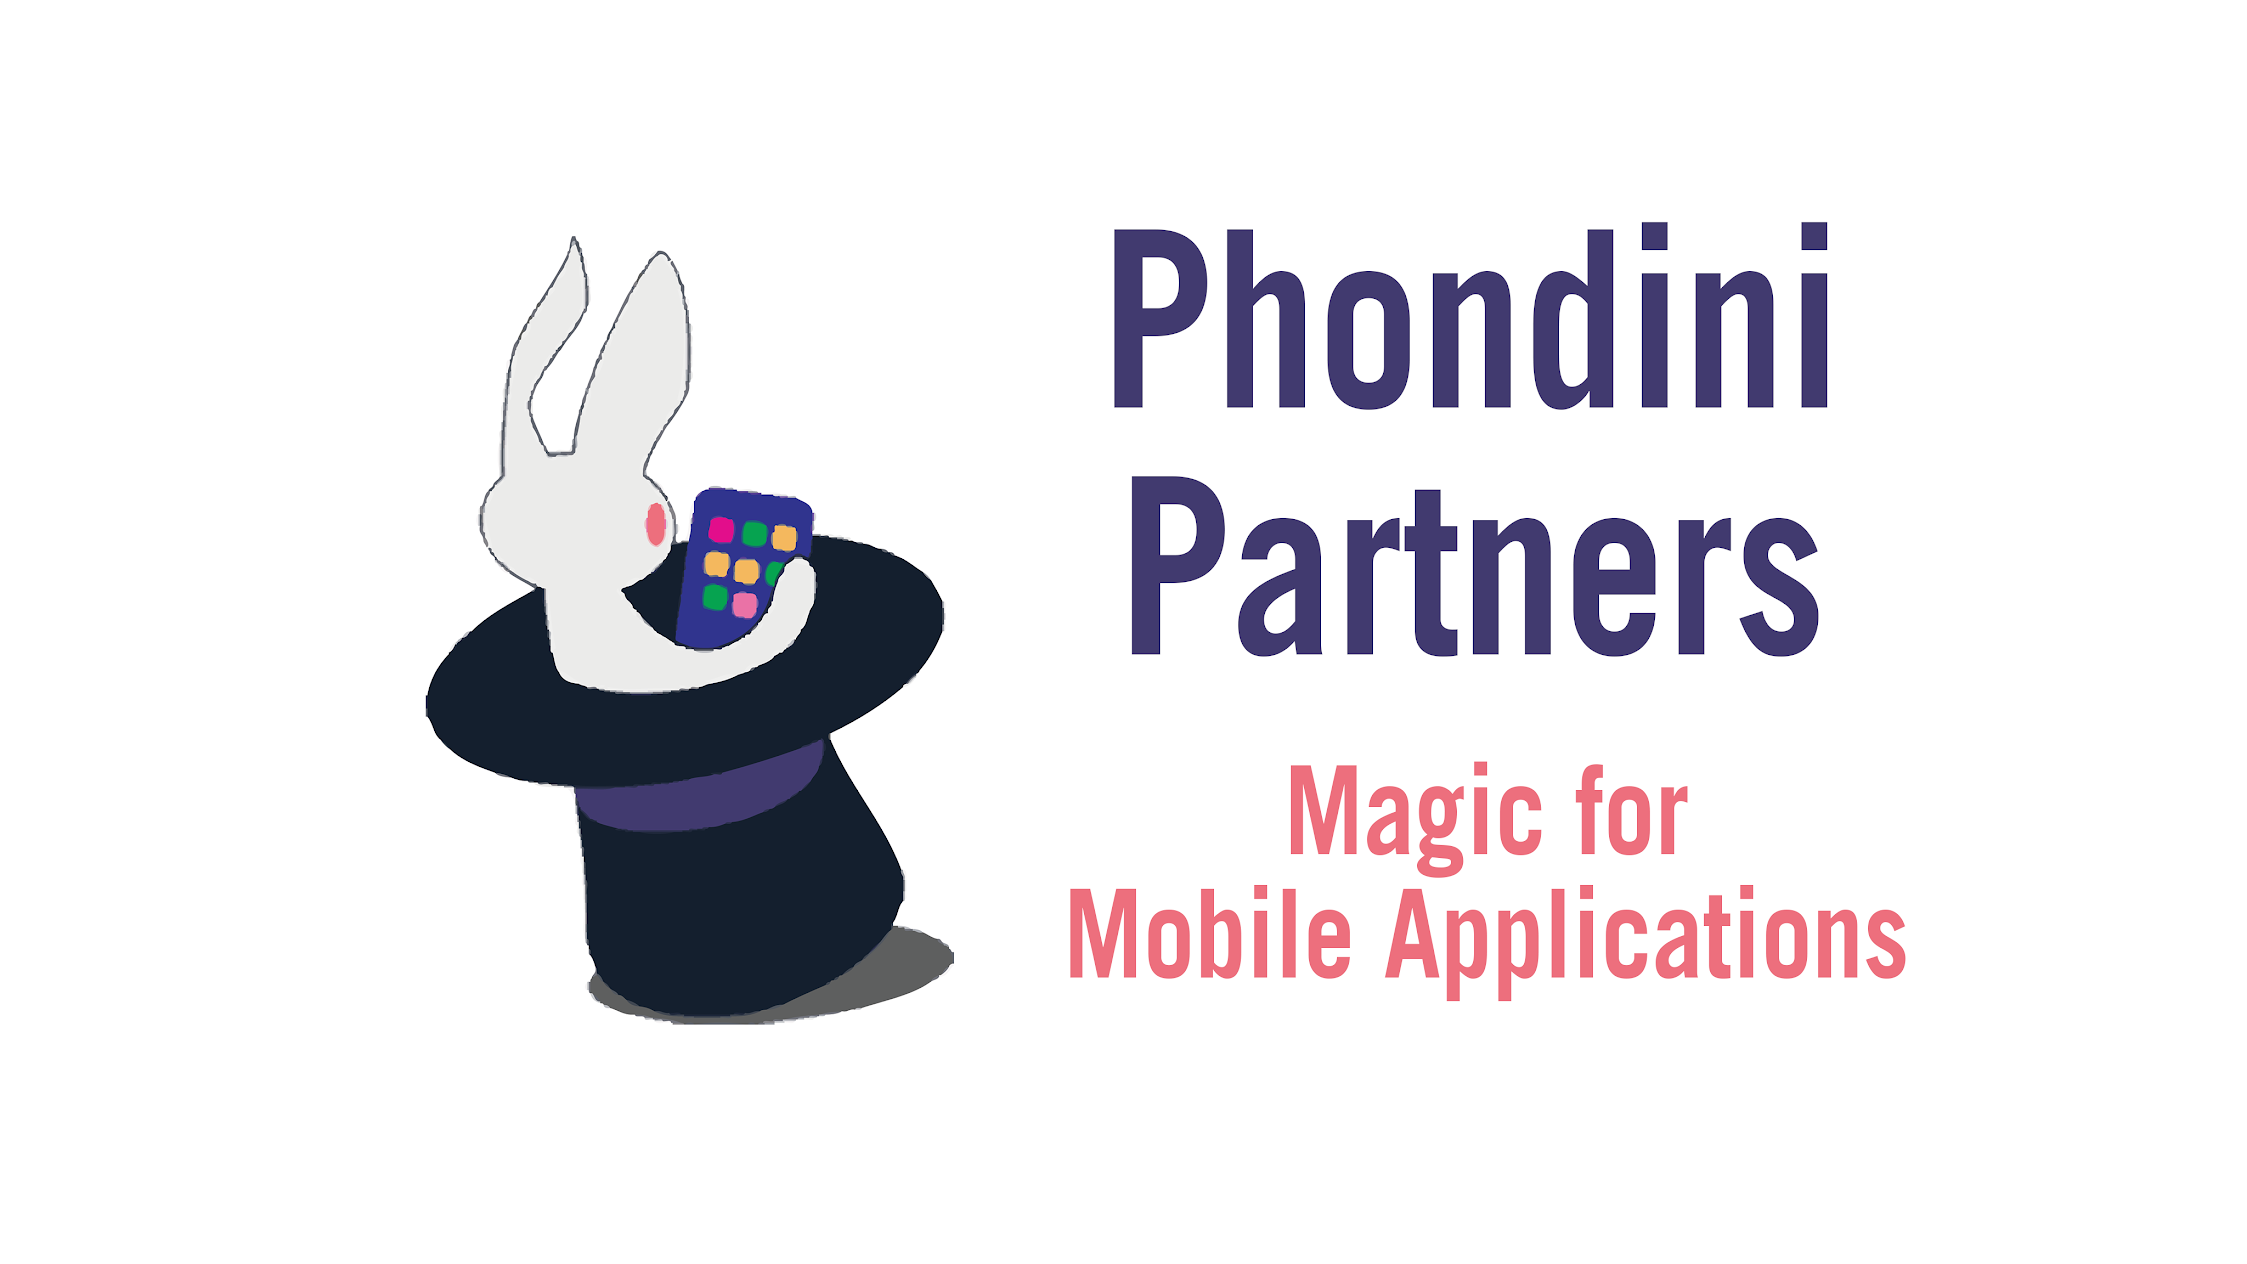 Phondini Partners LLC